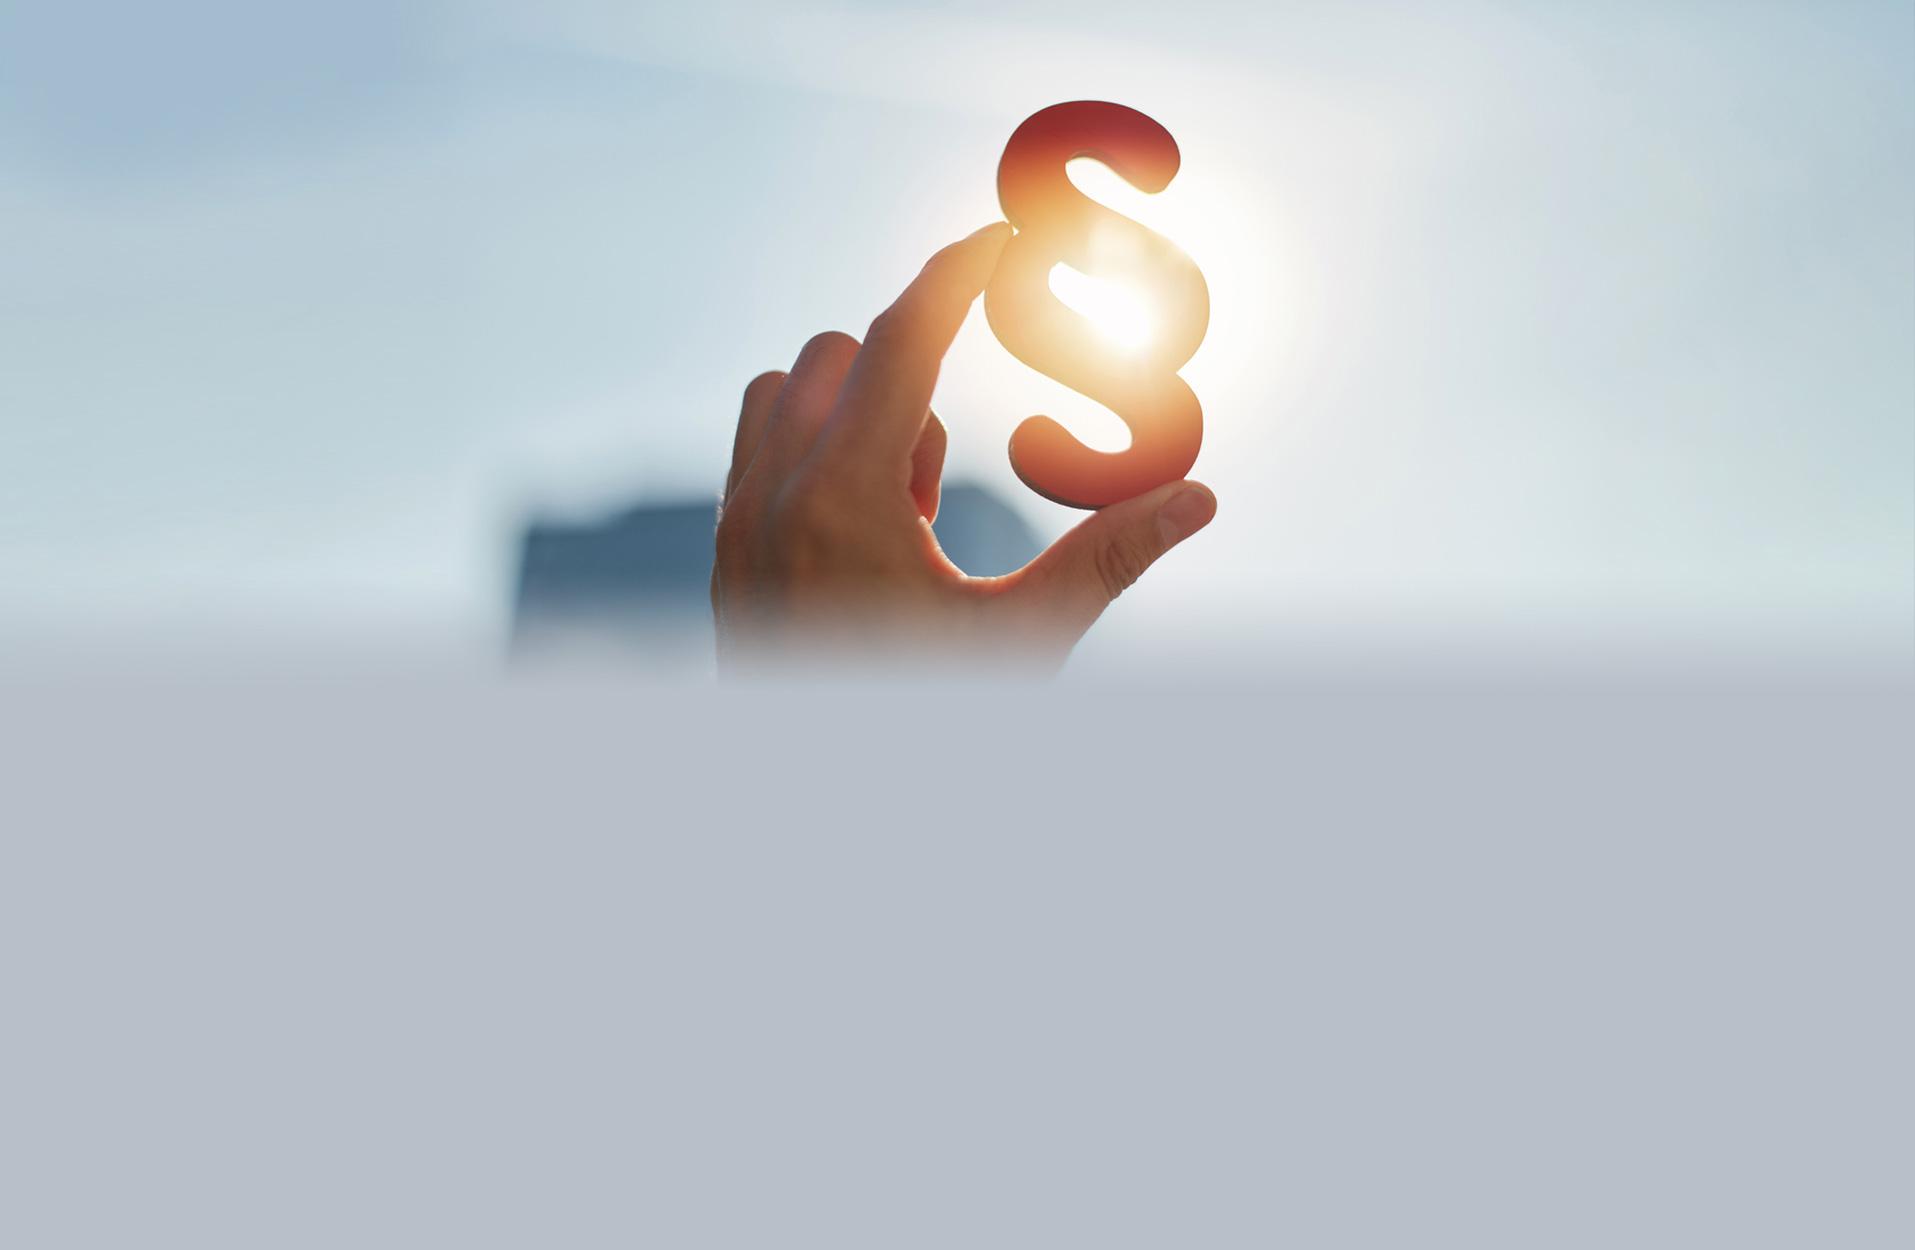 Hand hält Paragraphen Symbol in Sonne